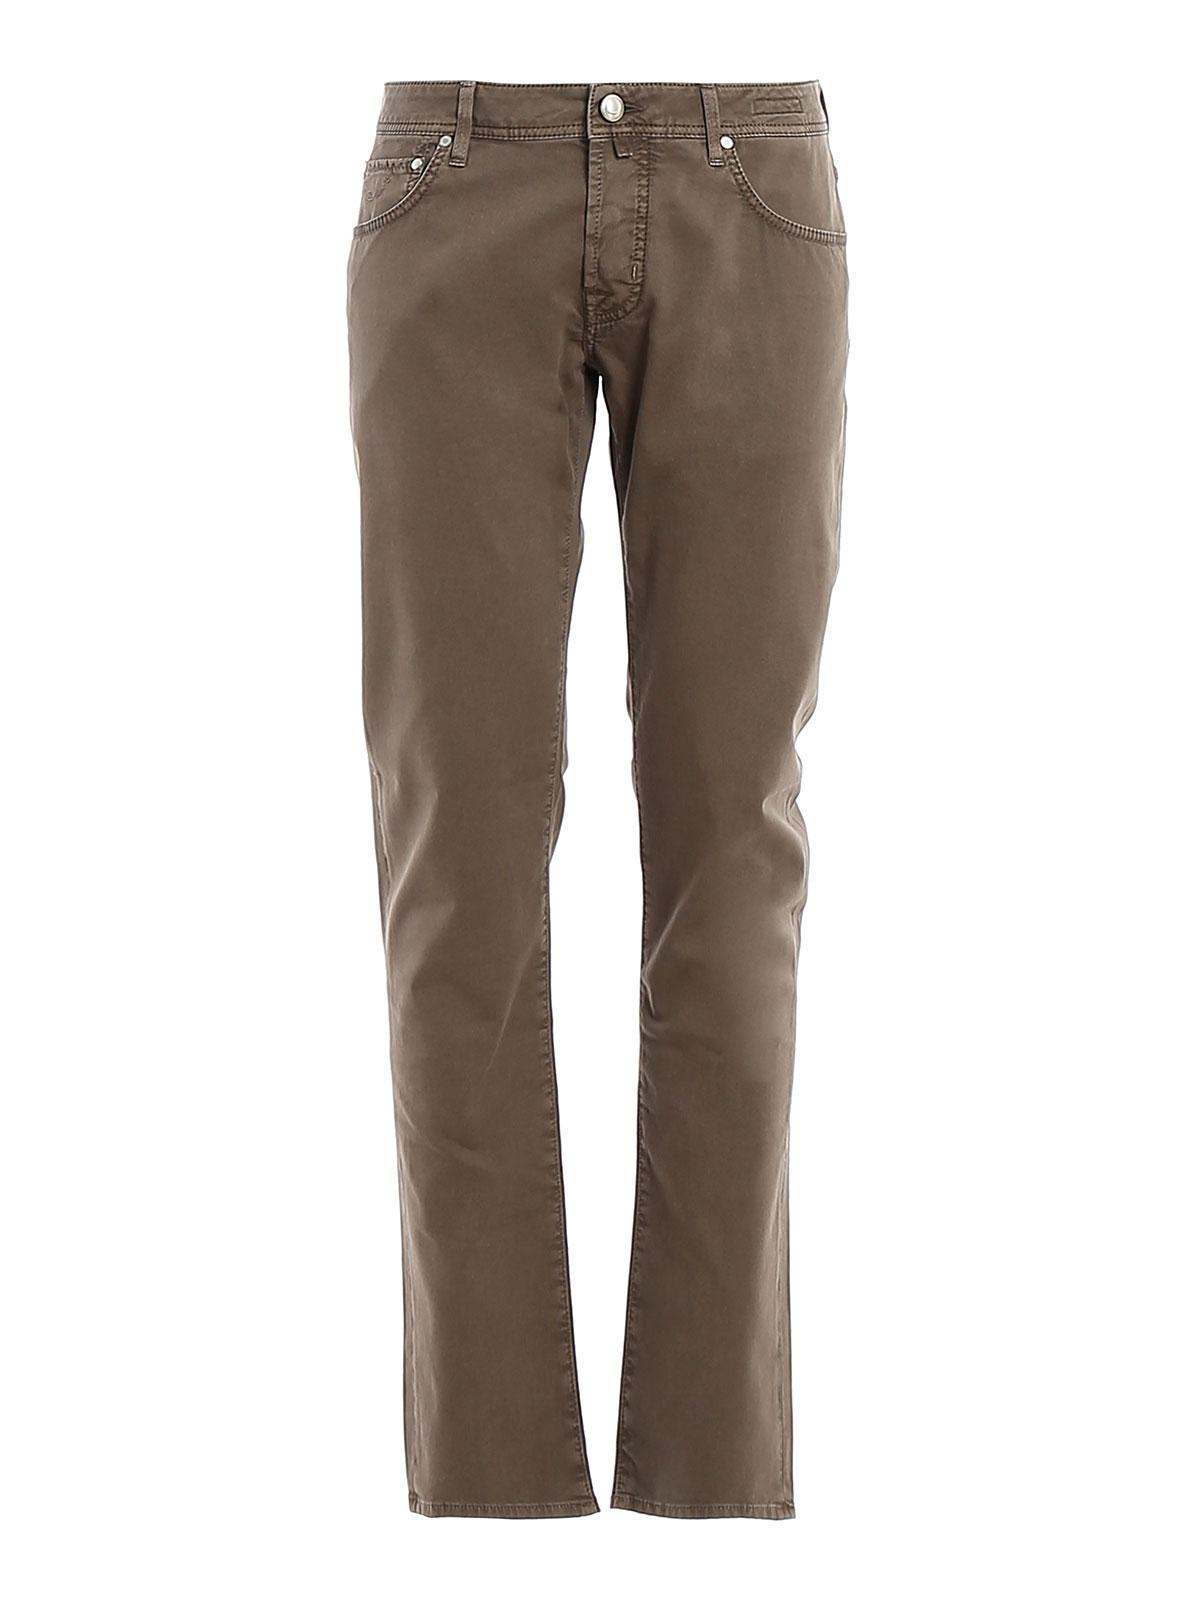 Immagine di JACOB COHEN | Pantaloni Uomo Style 622 Jacquard